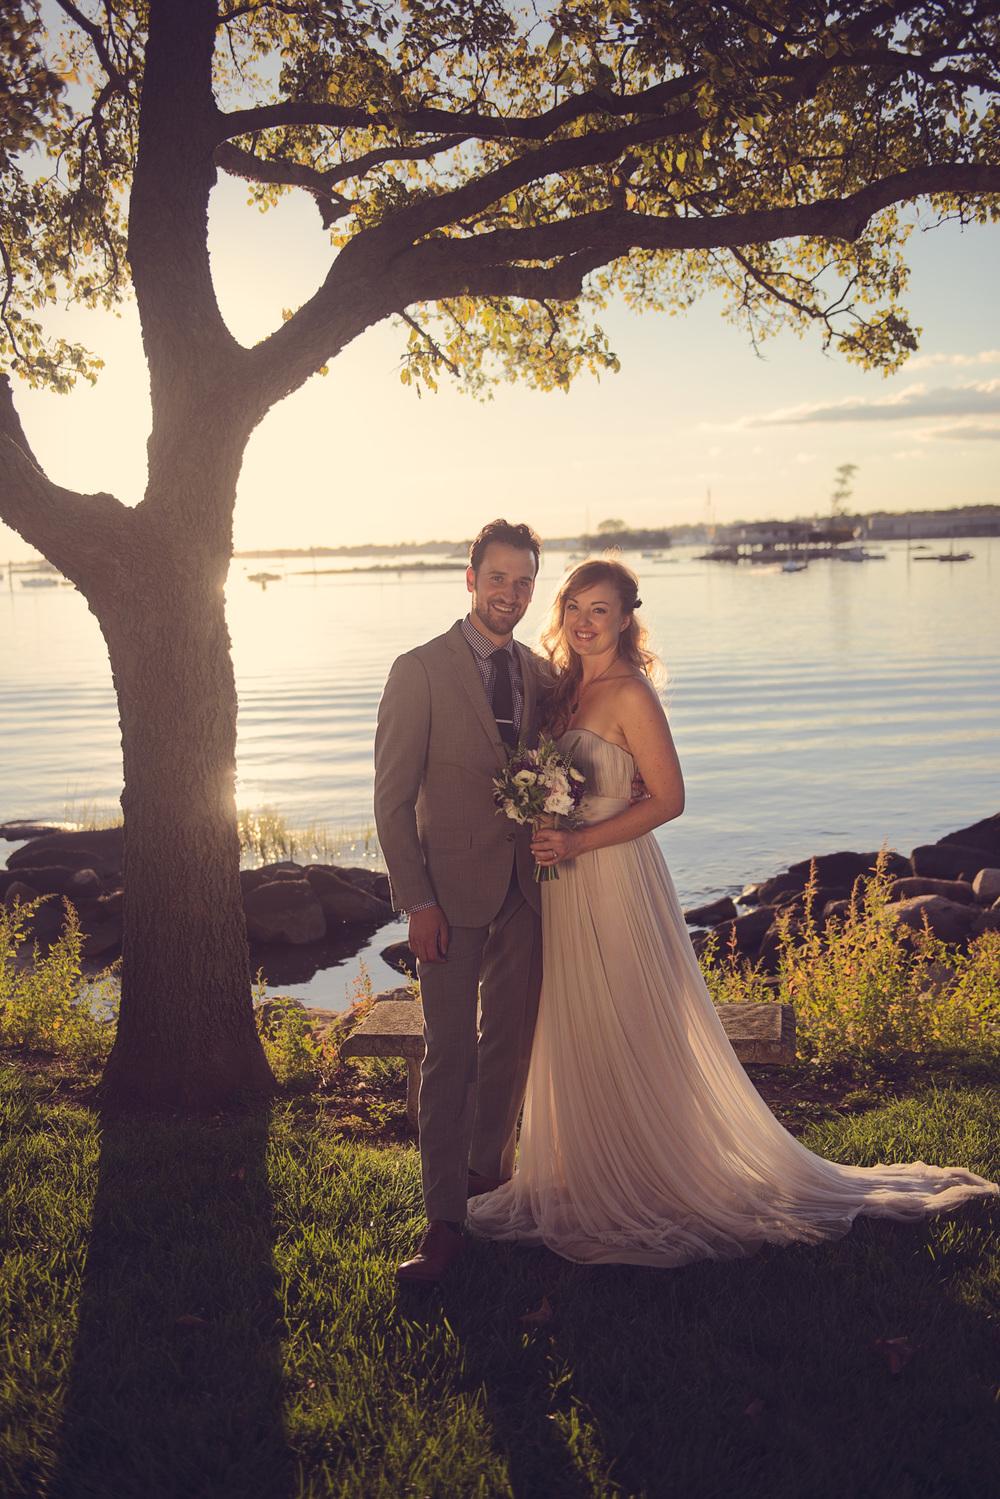 bride groom sunset bench tree beautiful husband wife coast ocean New England